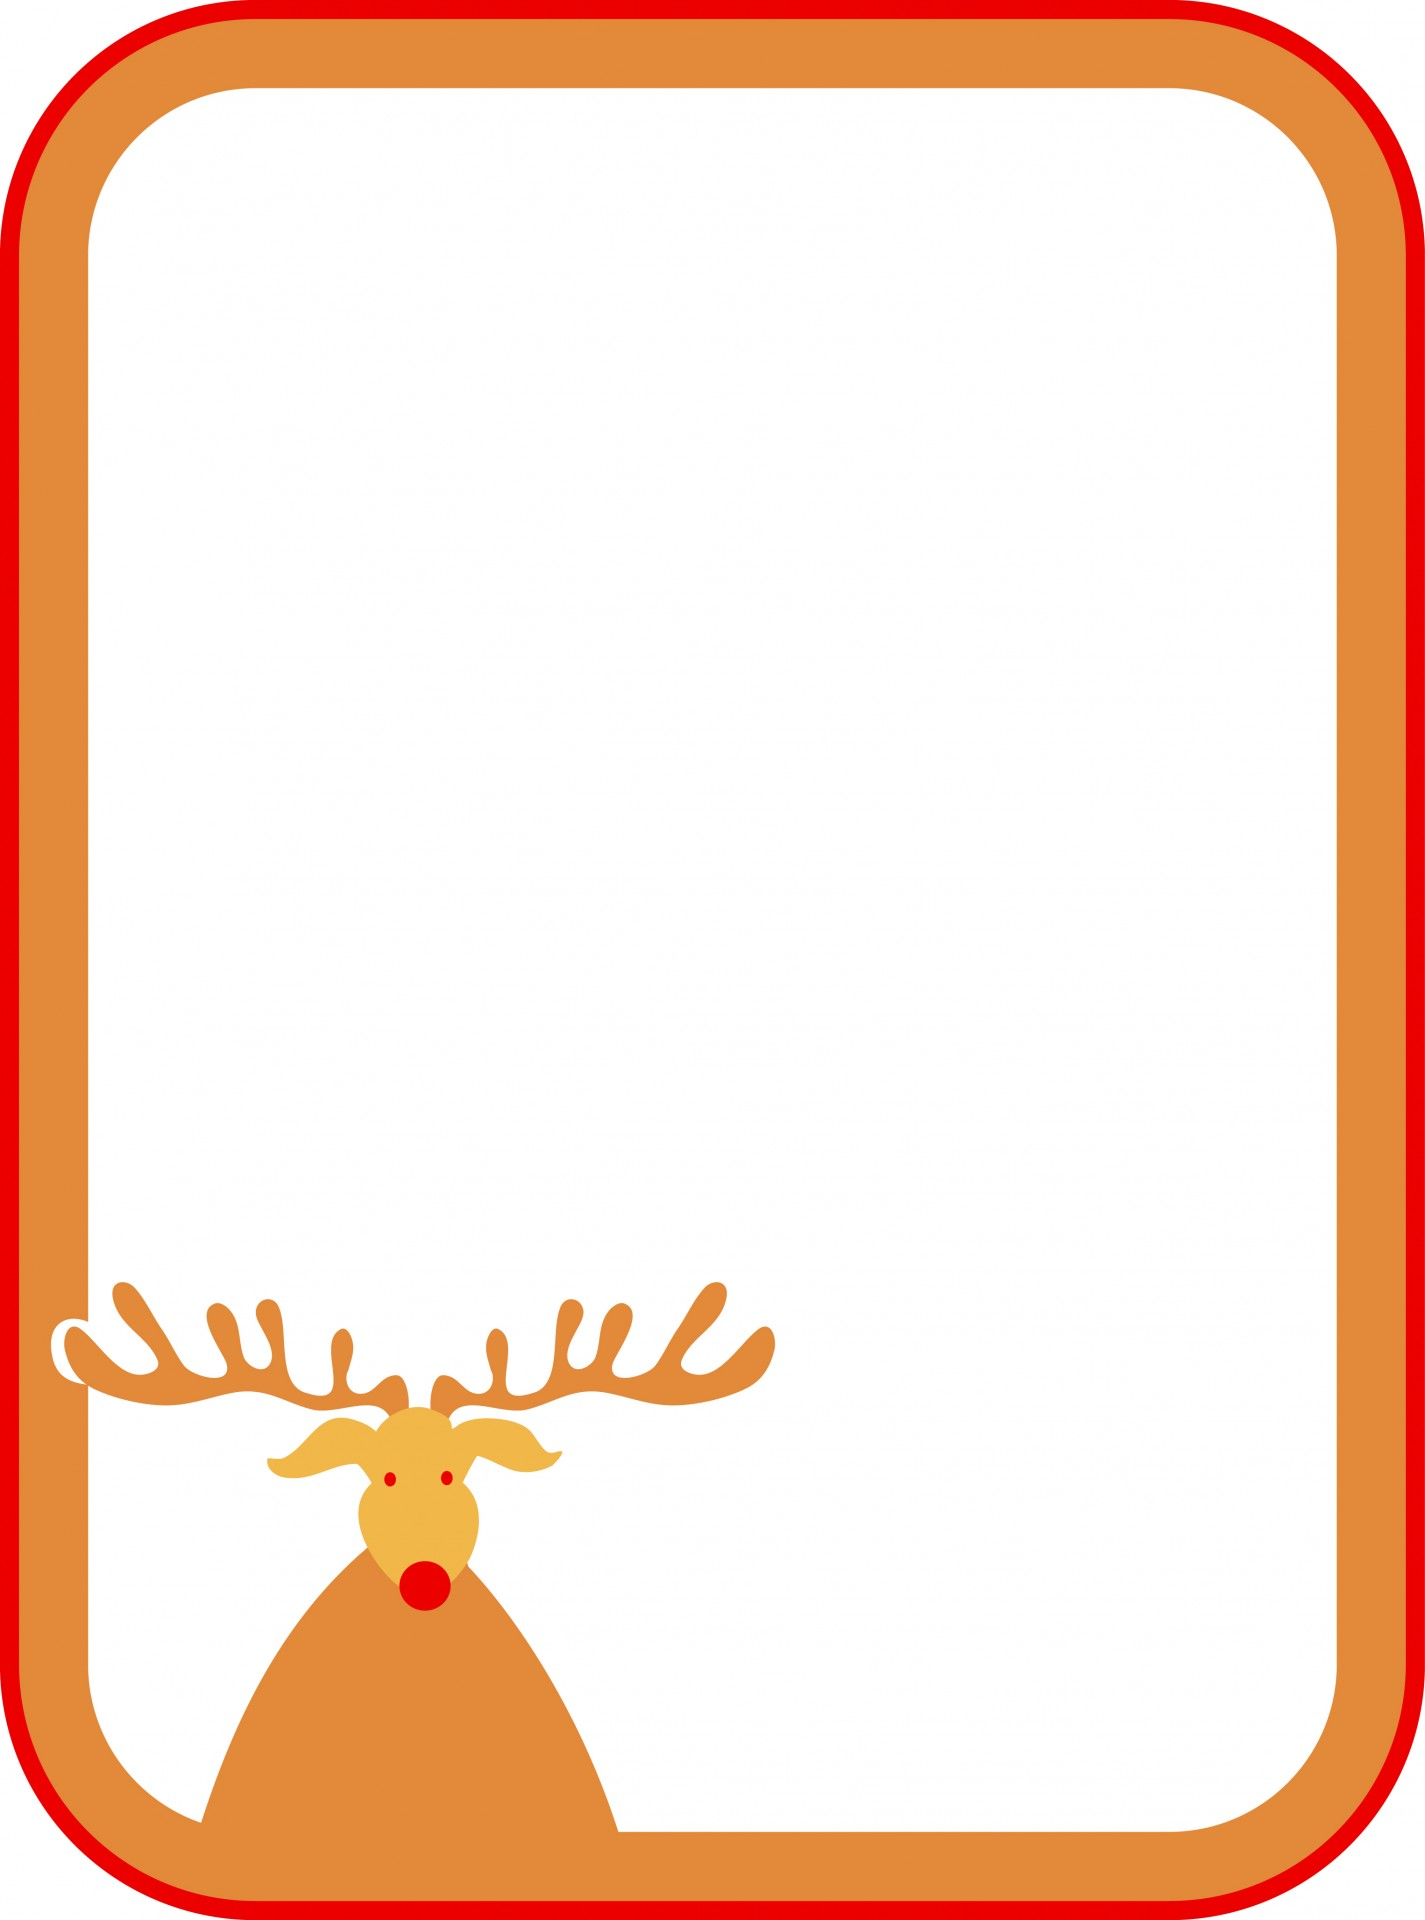 Rudolf Christmas Sign Free Stock Photo Public Domain